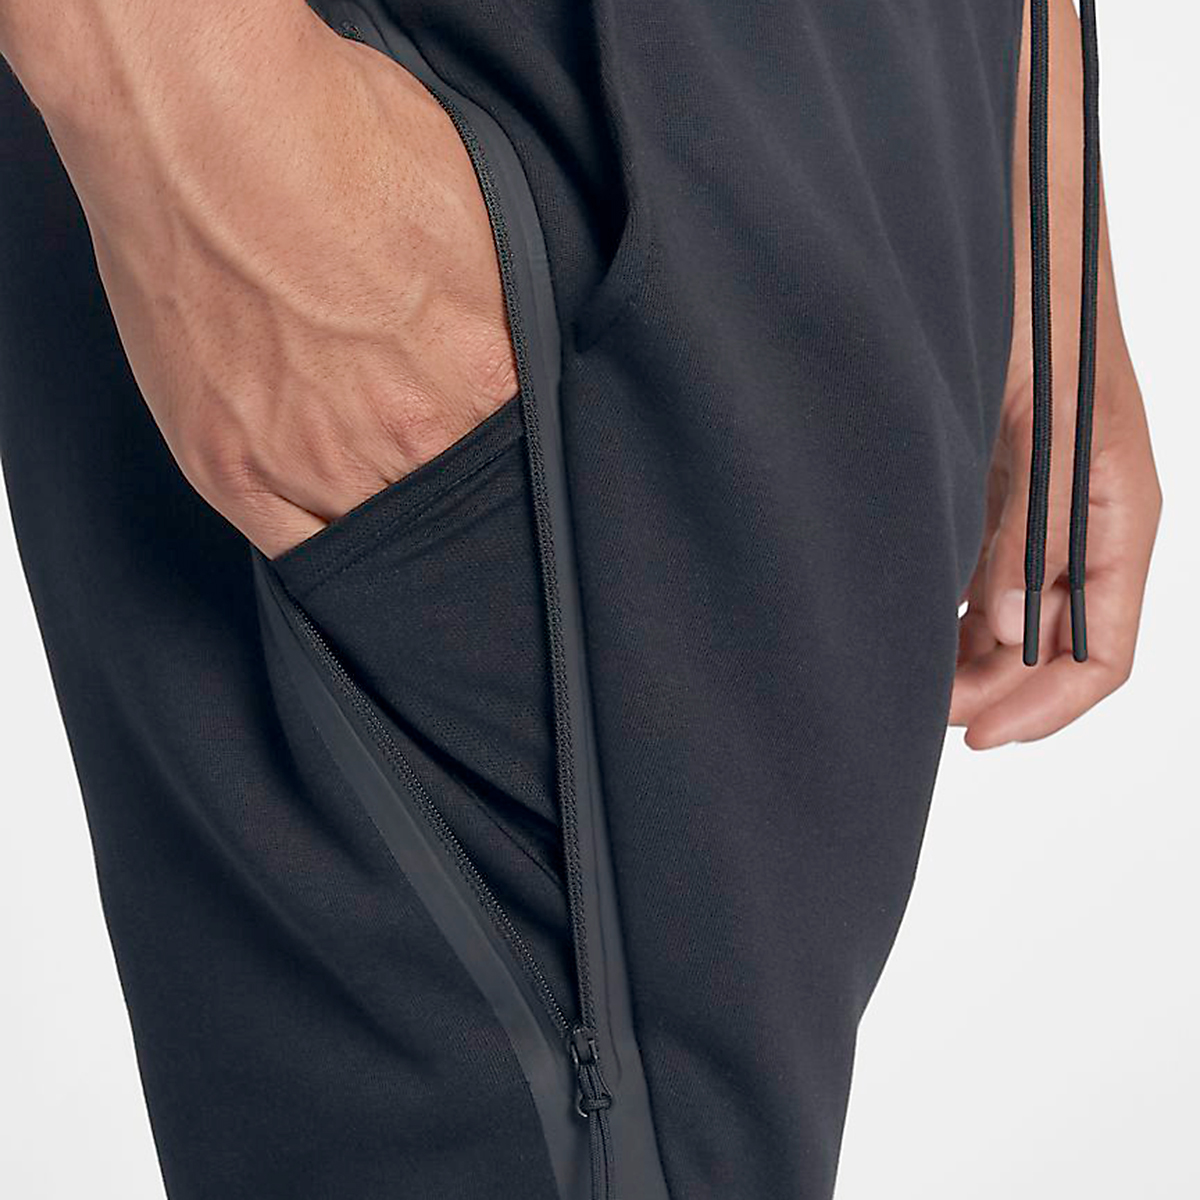 Men's Nike Tech Fleece Jogger - Color: Black - Size: L, Black, large, image 3